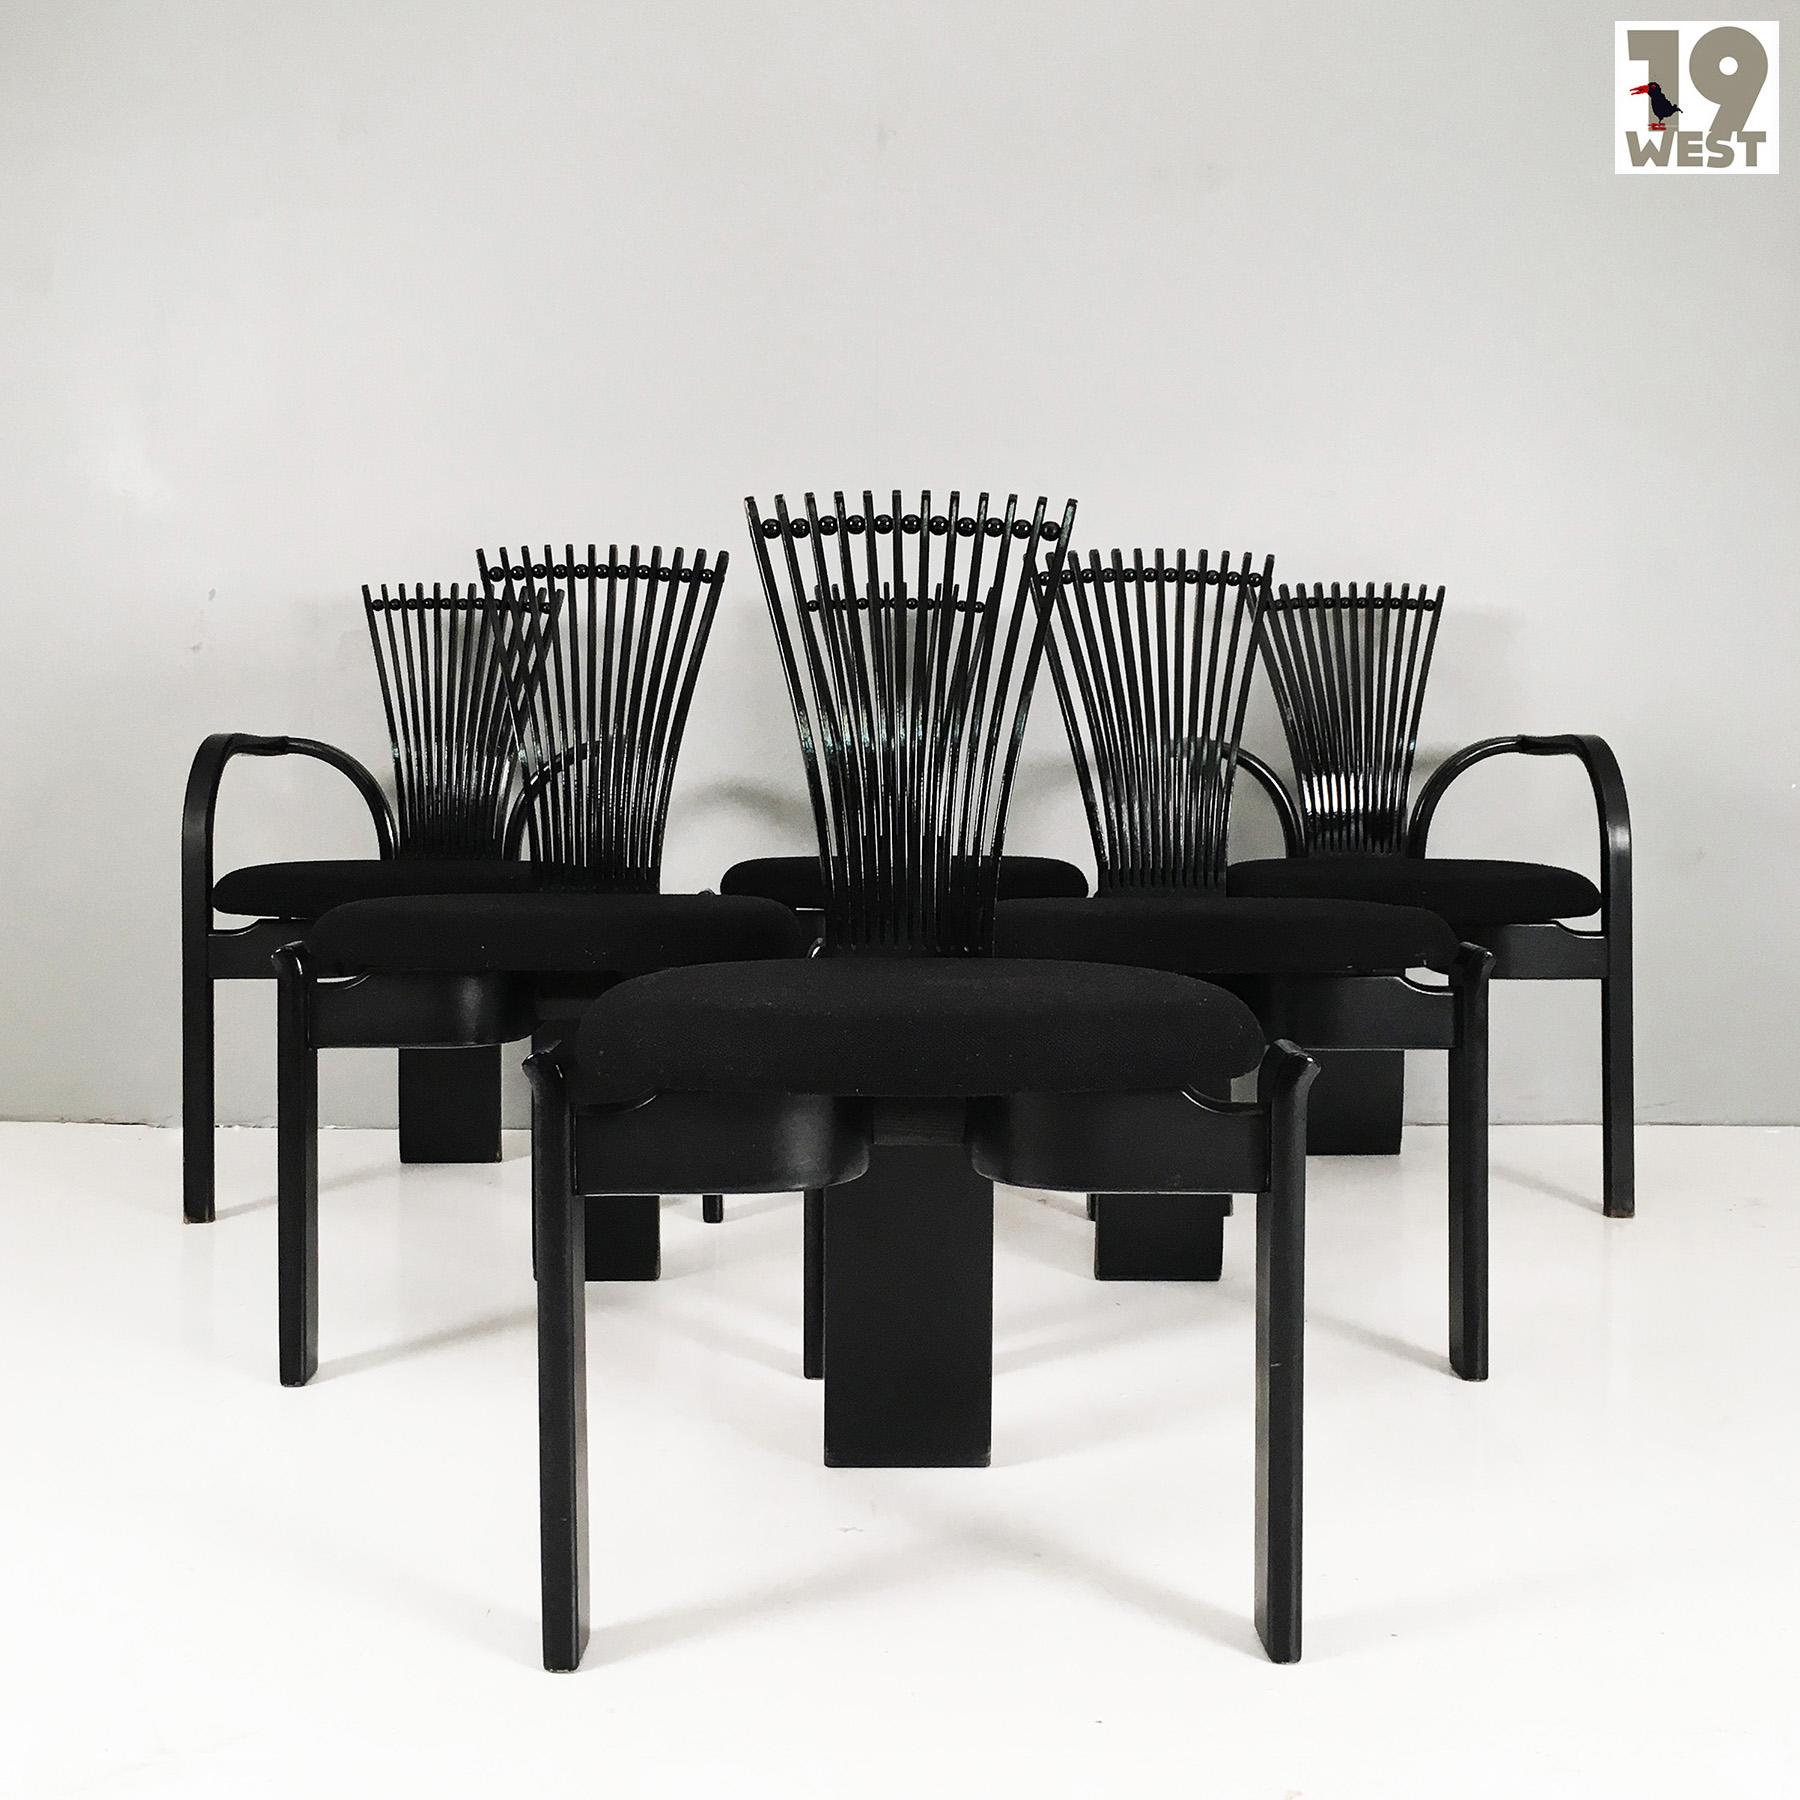 19west-cologne-vintage-six-totem-chairs-torstein-nielsen-westnofa-1980-13